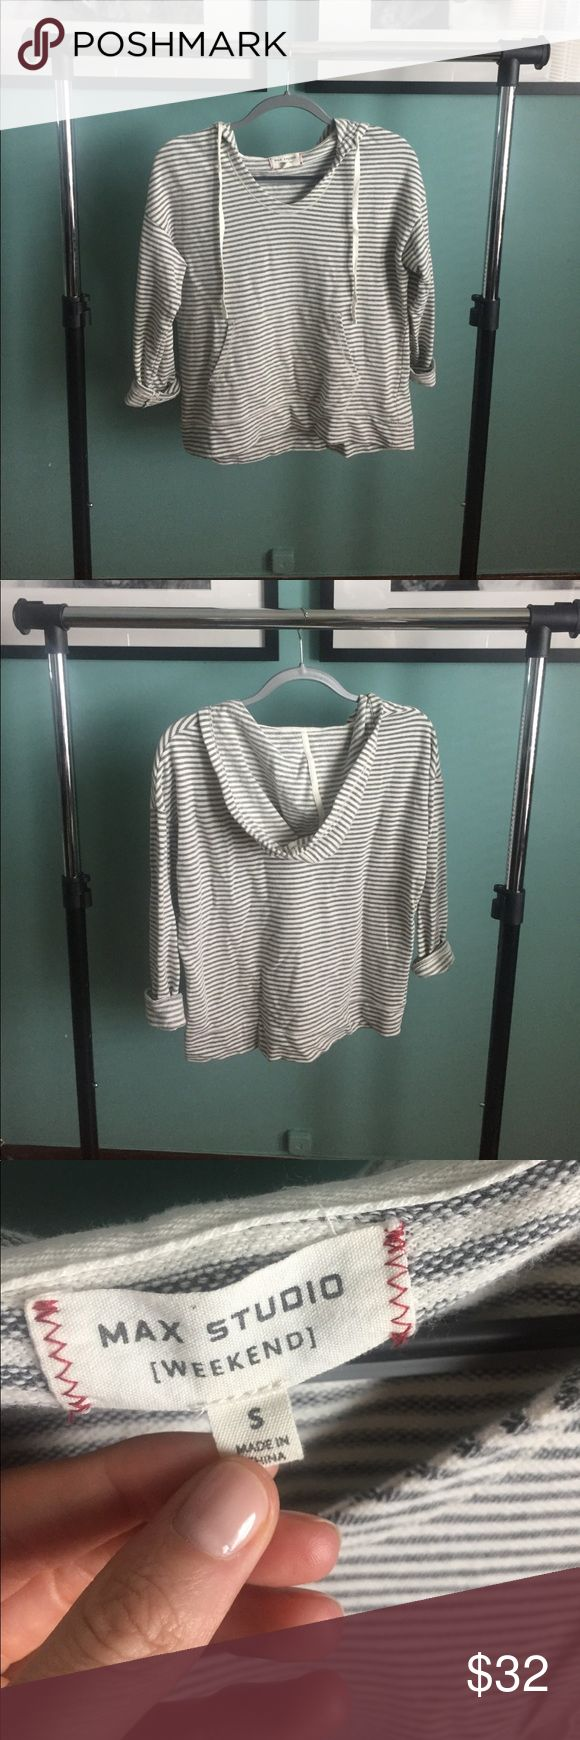 Max Studio Striped Hoodie   Size S So so cute and comfy! Love this one! EUC. Max Studio Tops Sweatshirts & Hoodies